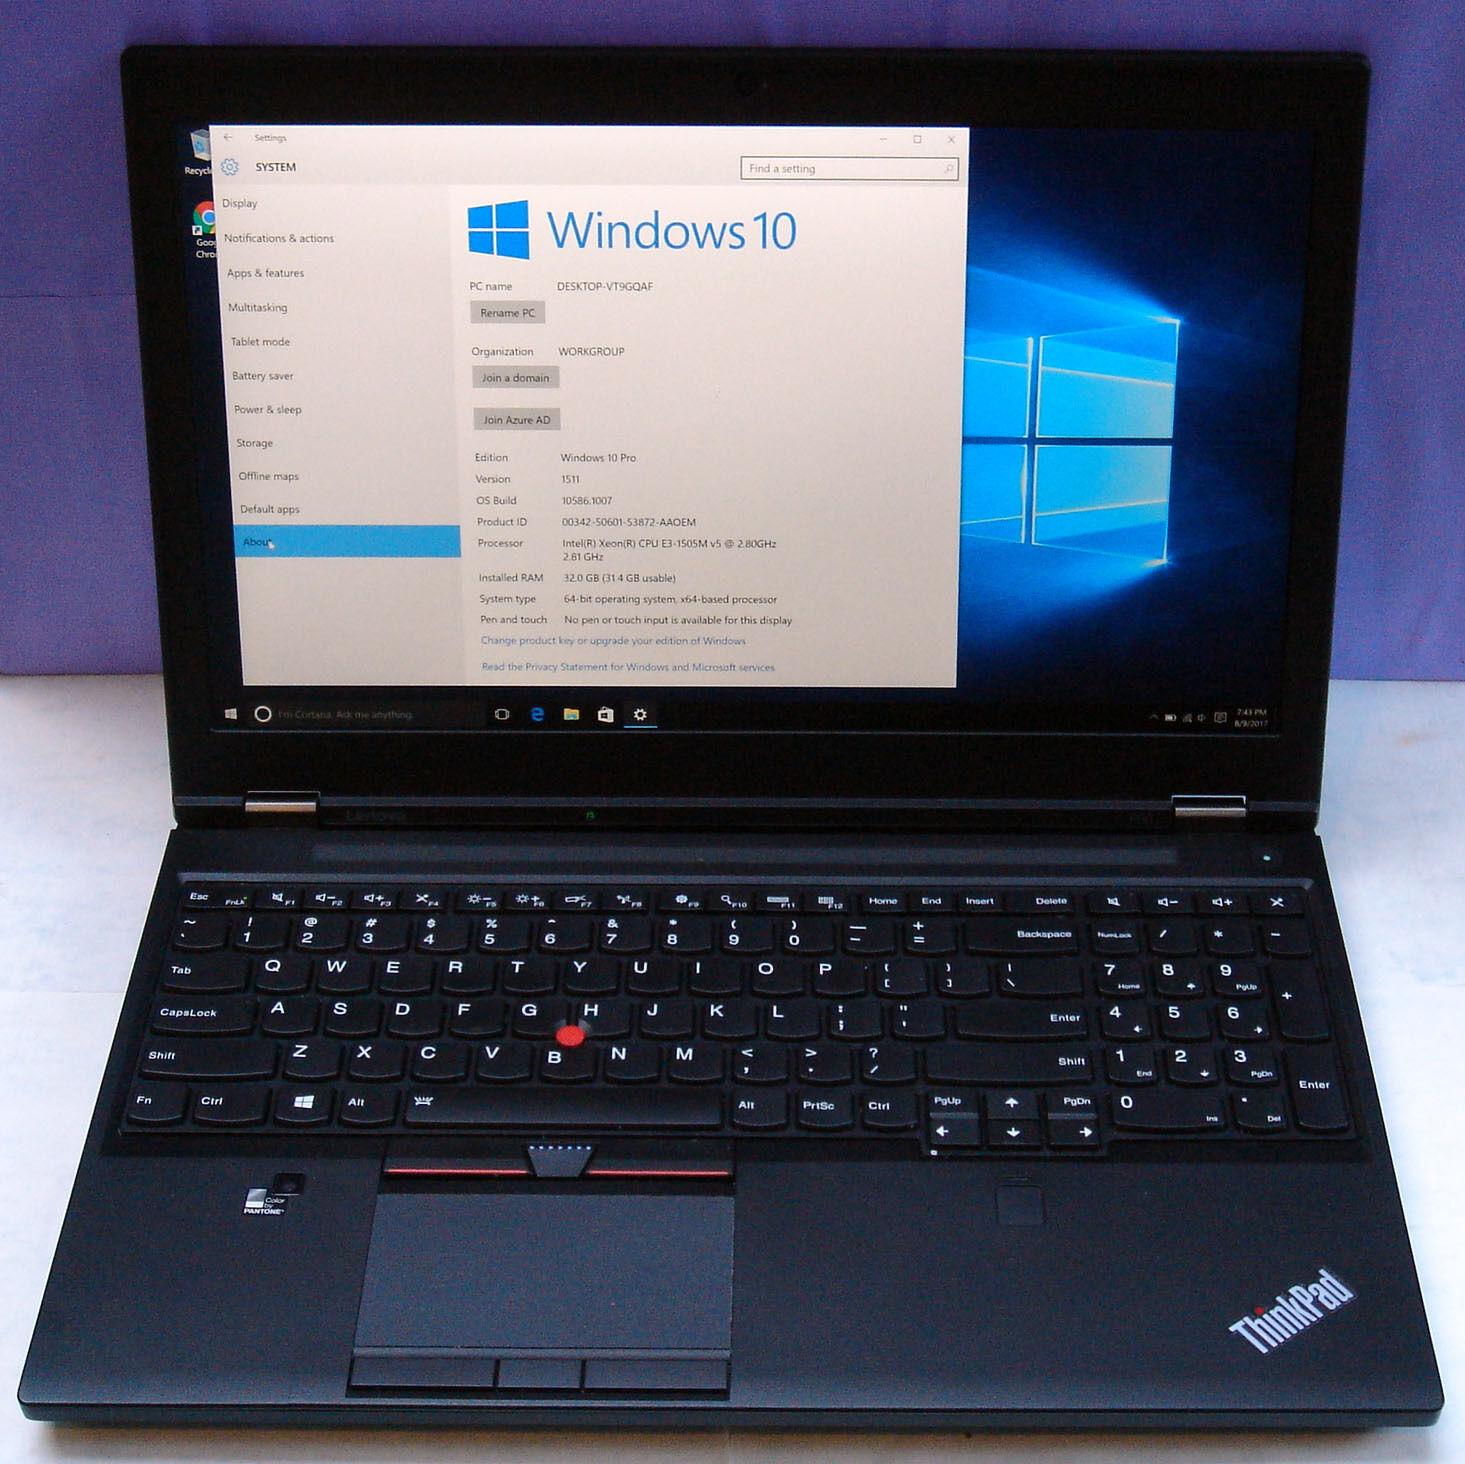 Thinkpad P50 Xeon E3-1505M 32GB 4K 512GB 4K, 2 Years Upgraded Warranty